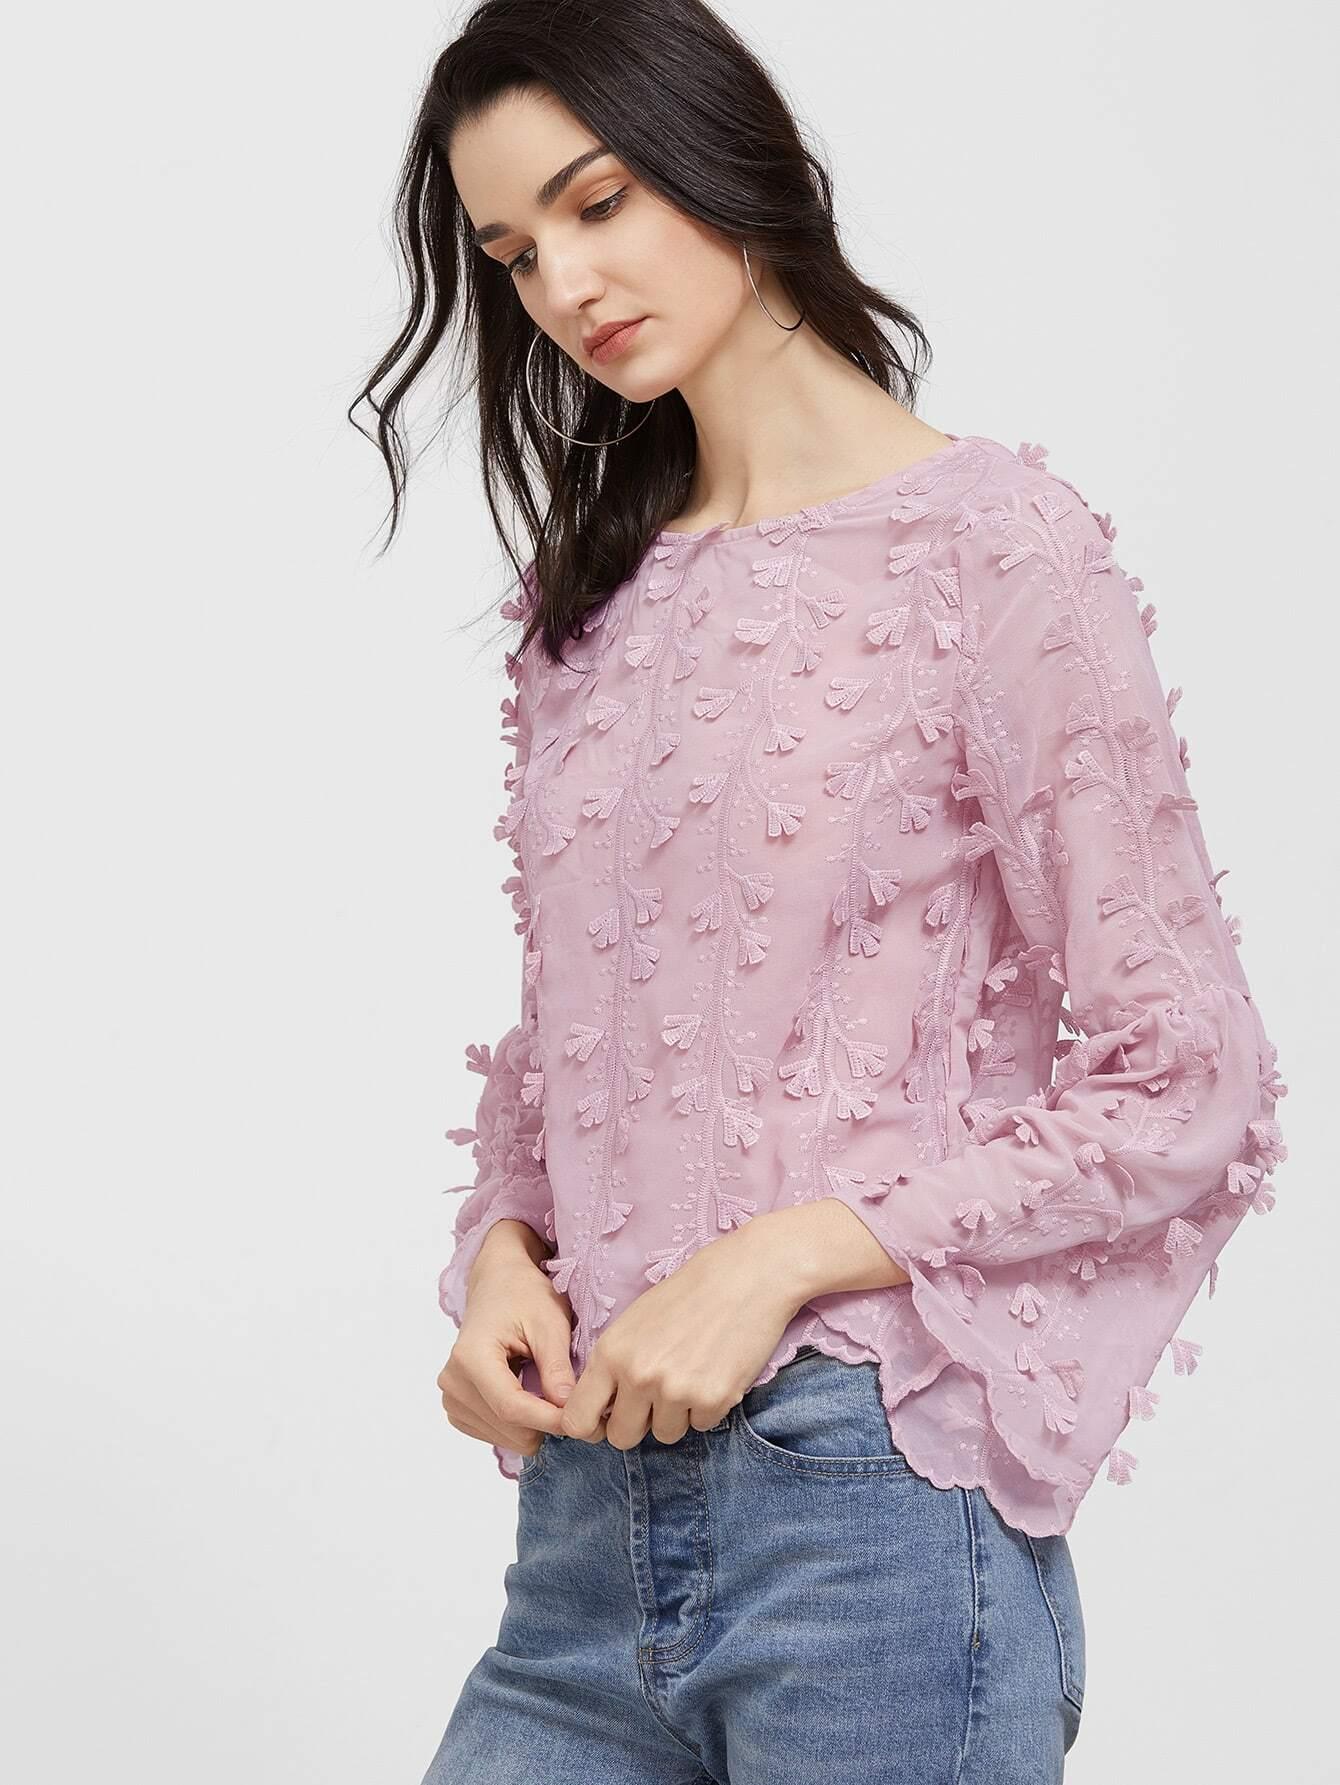 blouse170210451_2